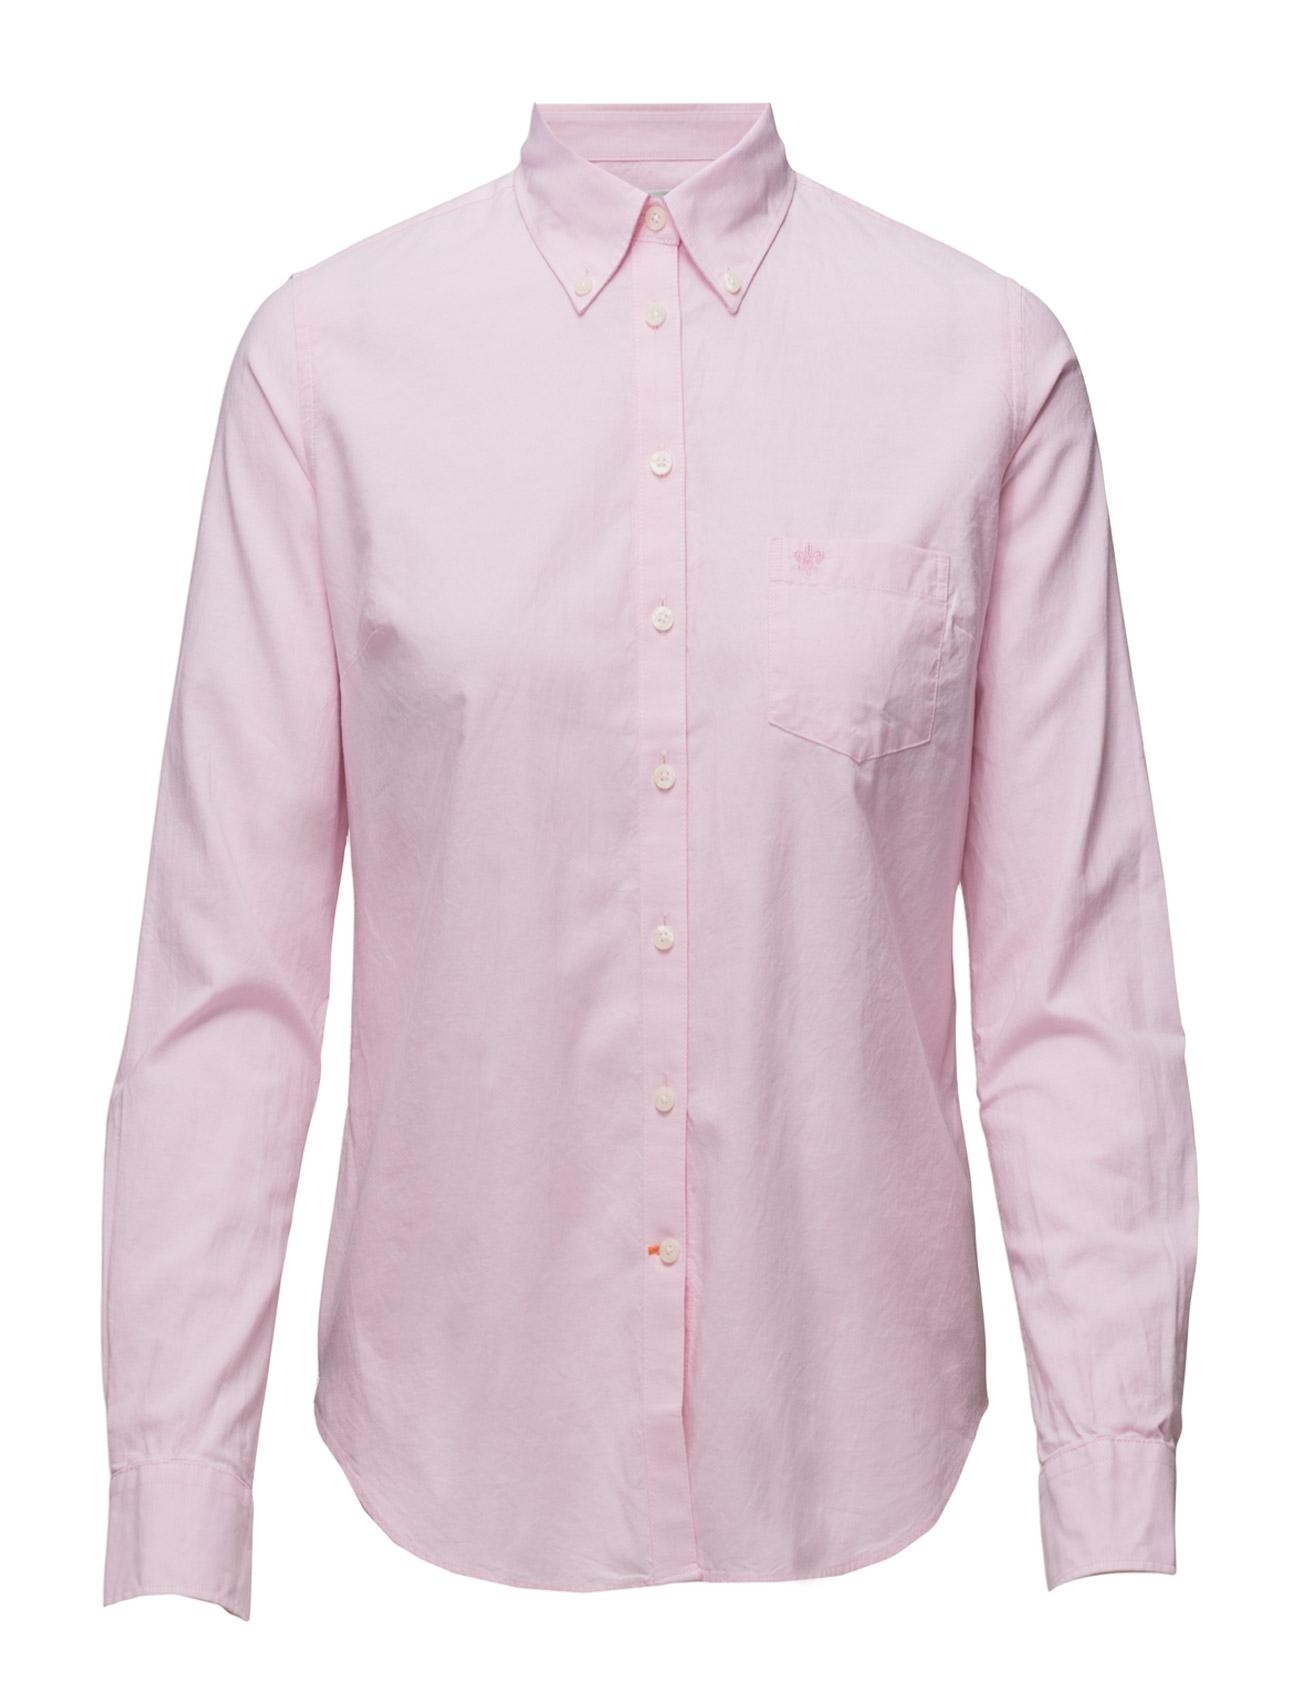 Classic Oxford Shirt Langærmet Skjorte Lyserød Morris Lady